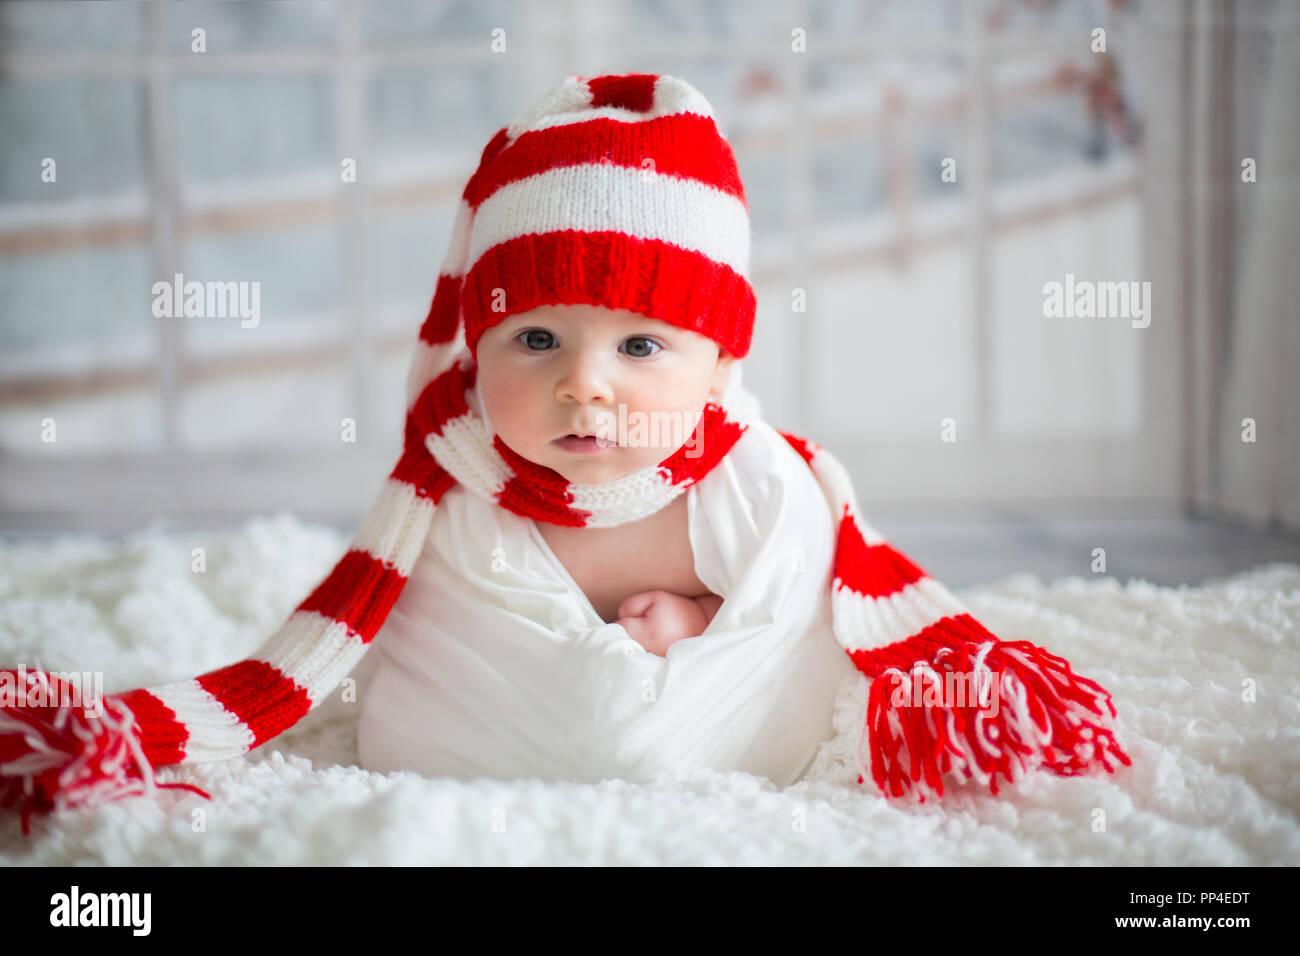 Christmas portrait of cute little newborn baby boy 9cd7e9e3456